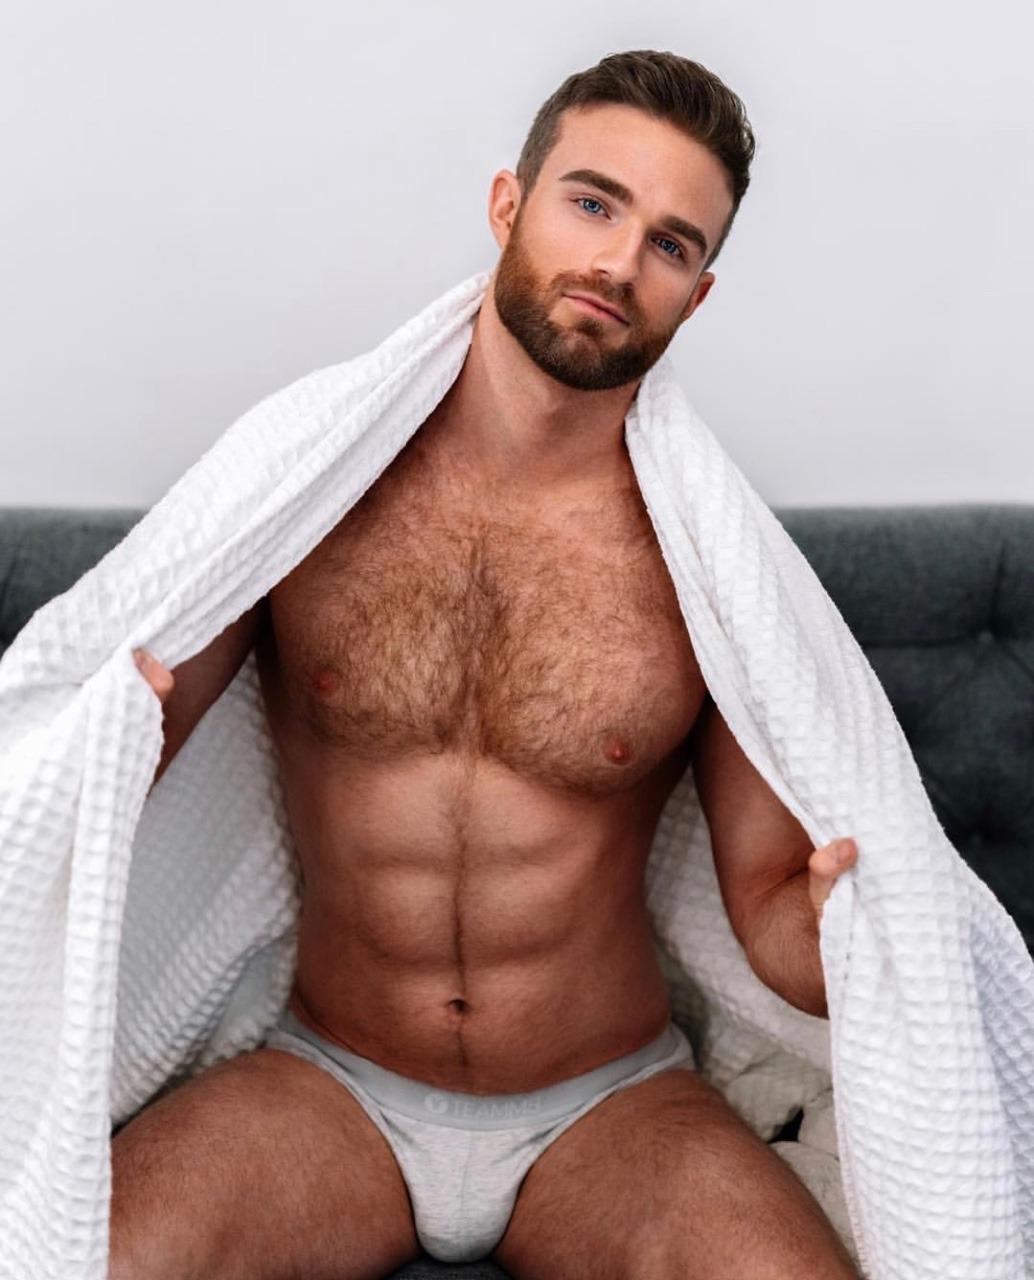 arquette-boobs-hot-men-naked-having-sex-magazine-nude